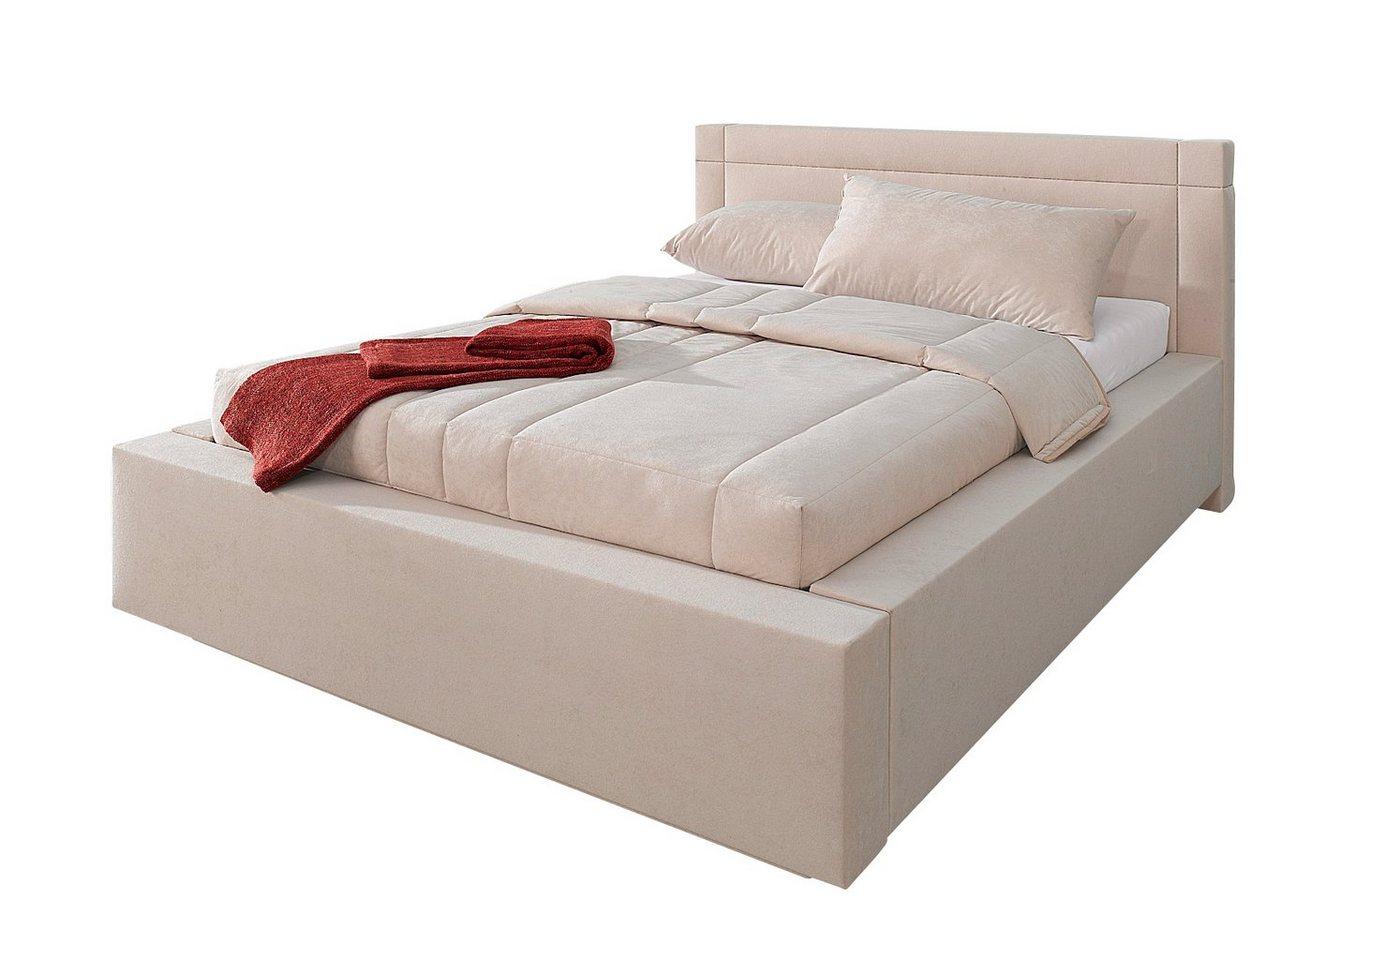 Westfalia Schlafkomfort Polsterbett, mit Bettkasten | Schlafzimmer > Betten > Polsterbetten | Westfalia Schlafkomfort